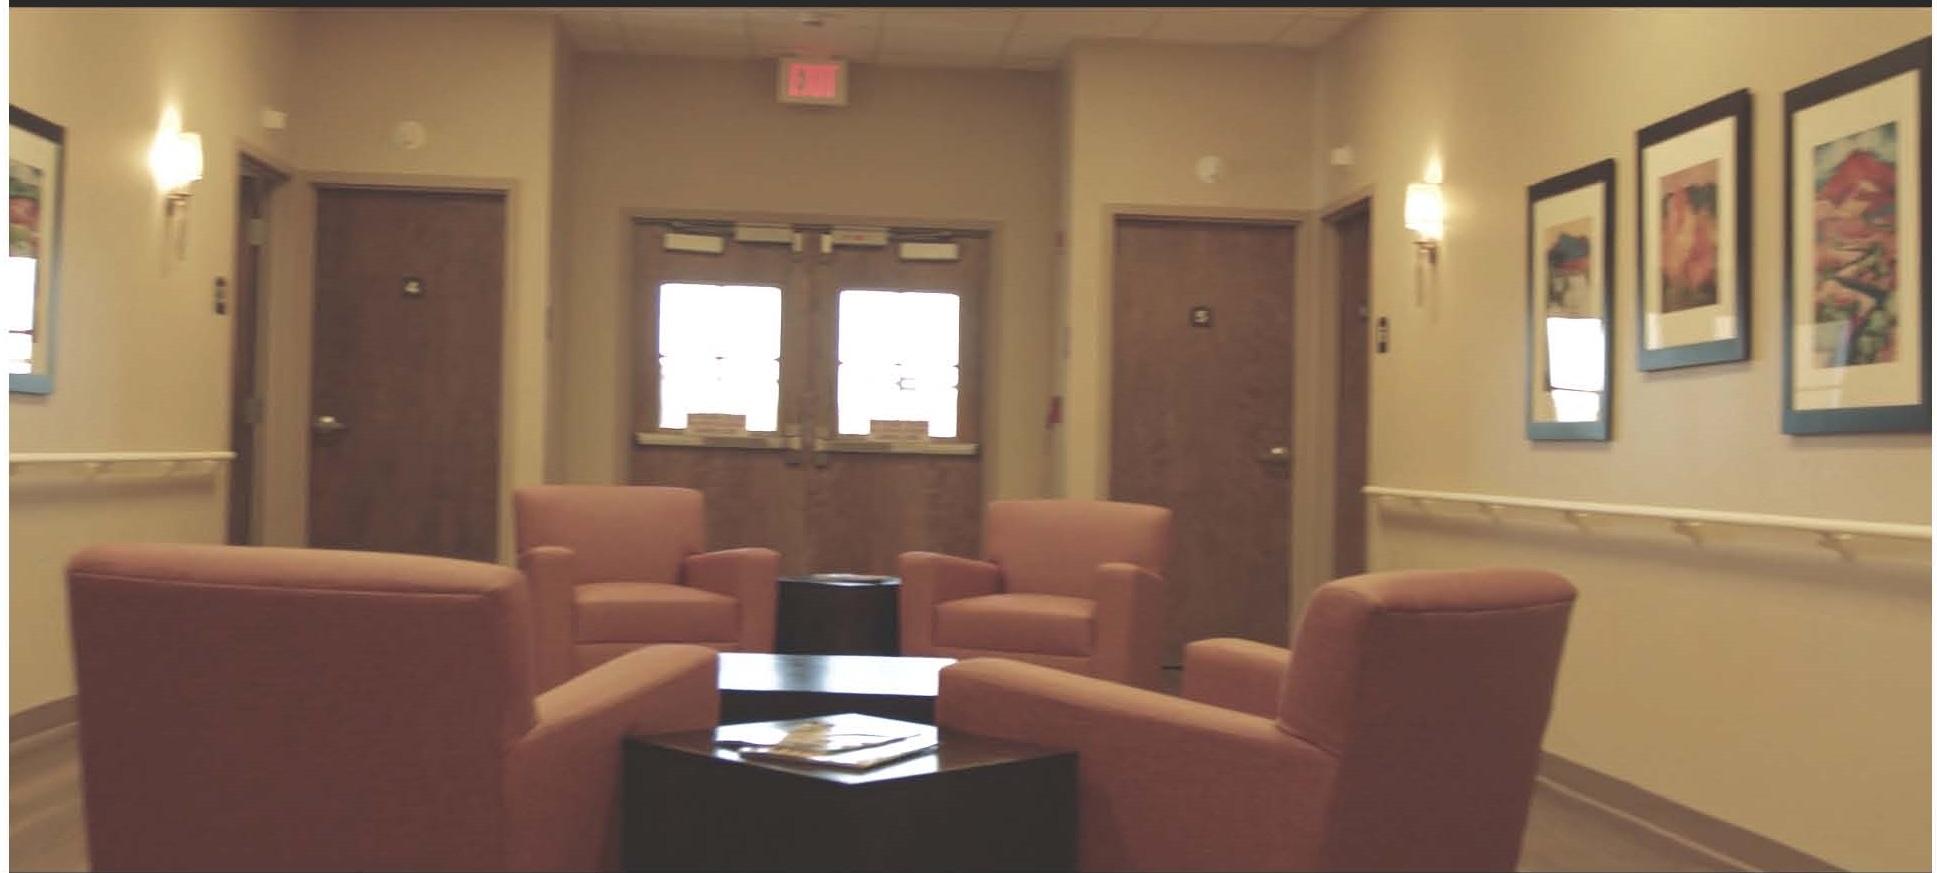 Mentis Neuro - El Paso Location Virtual Tour-HD on Vimeo15